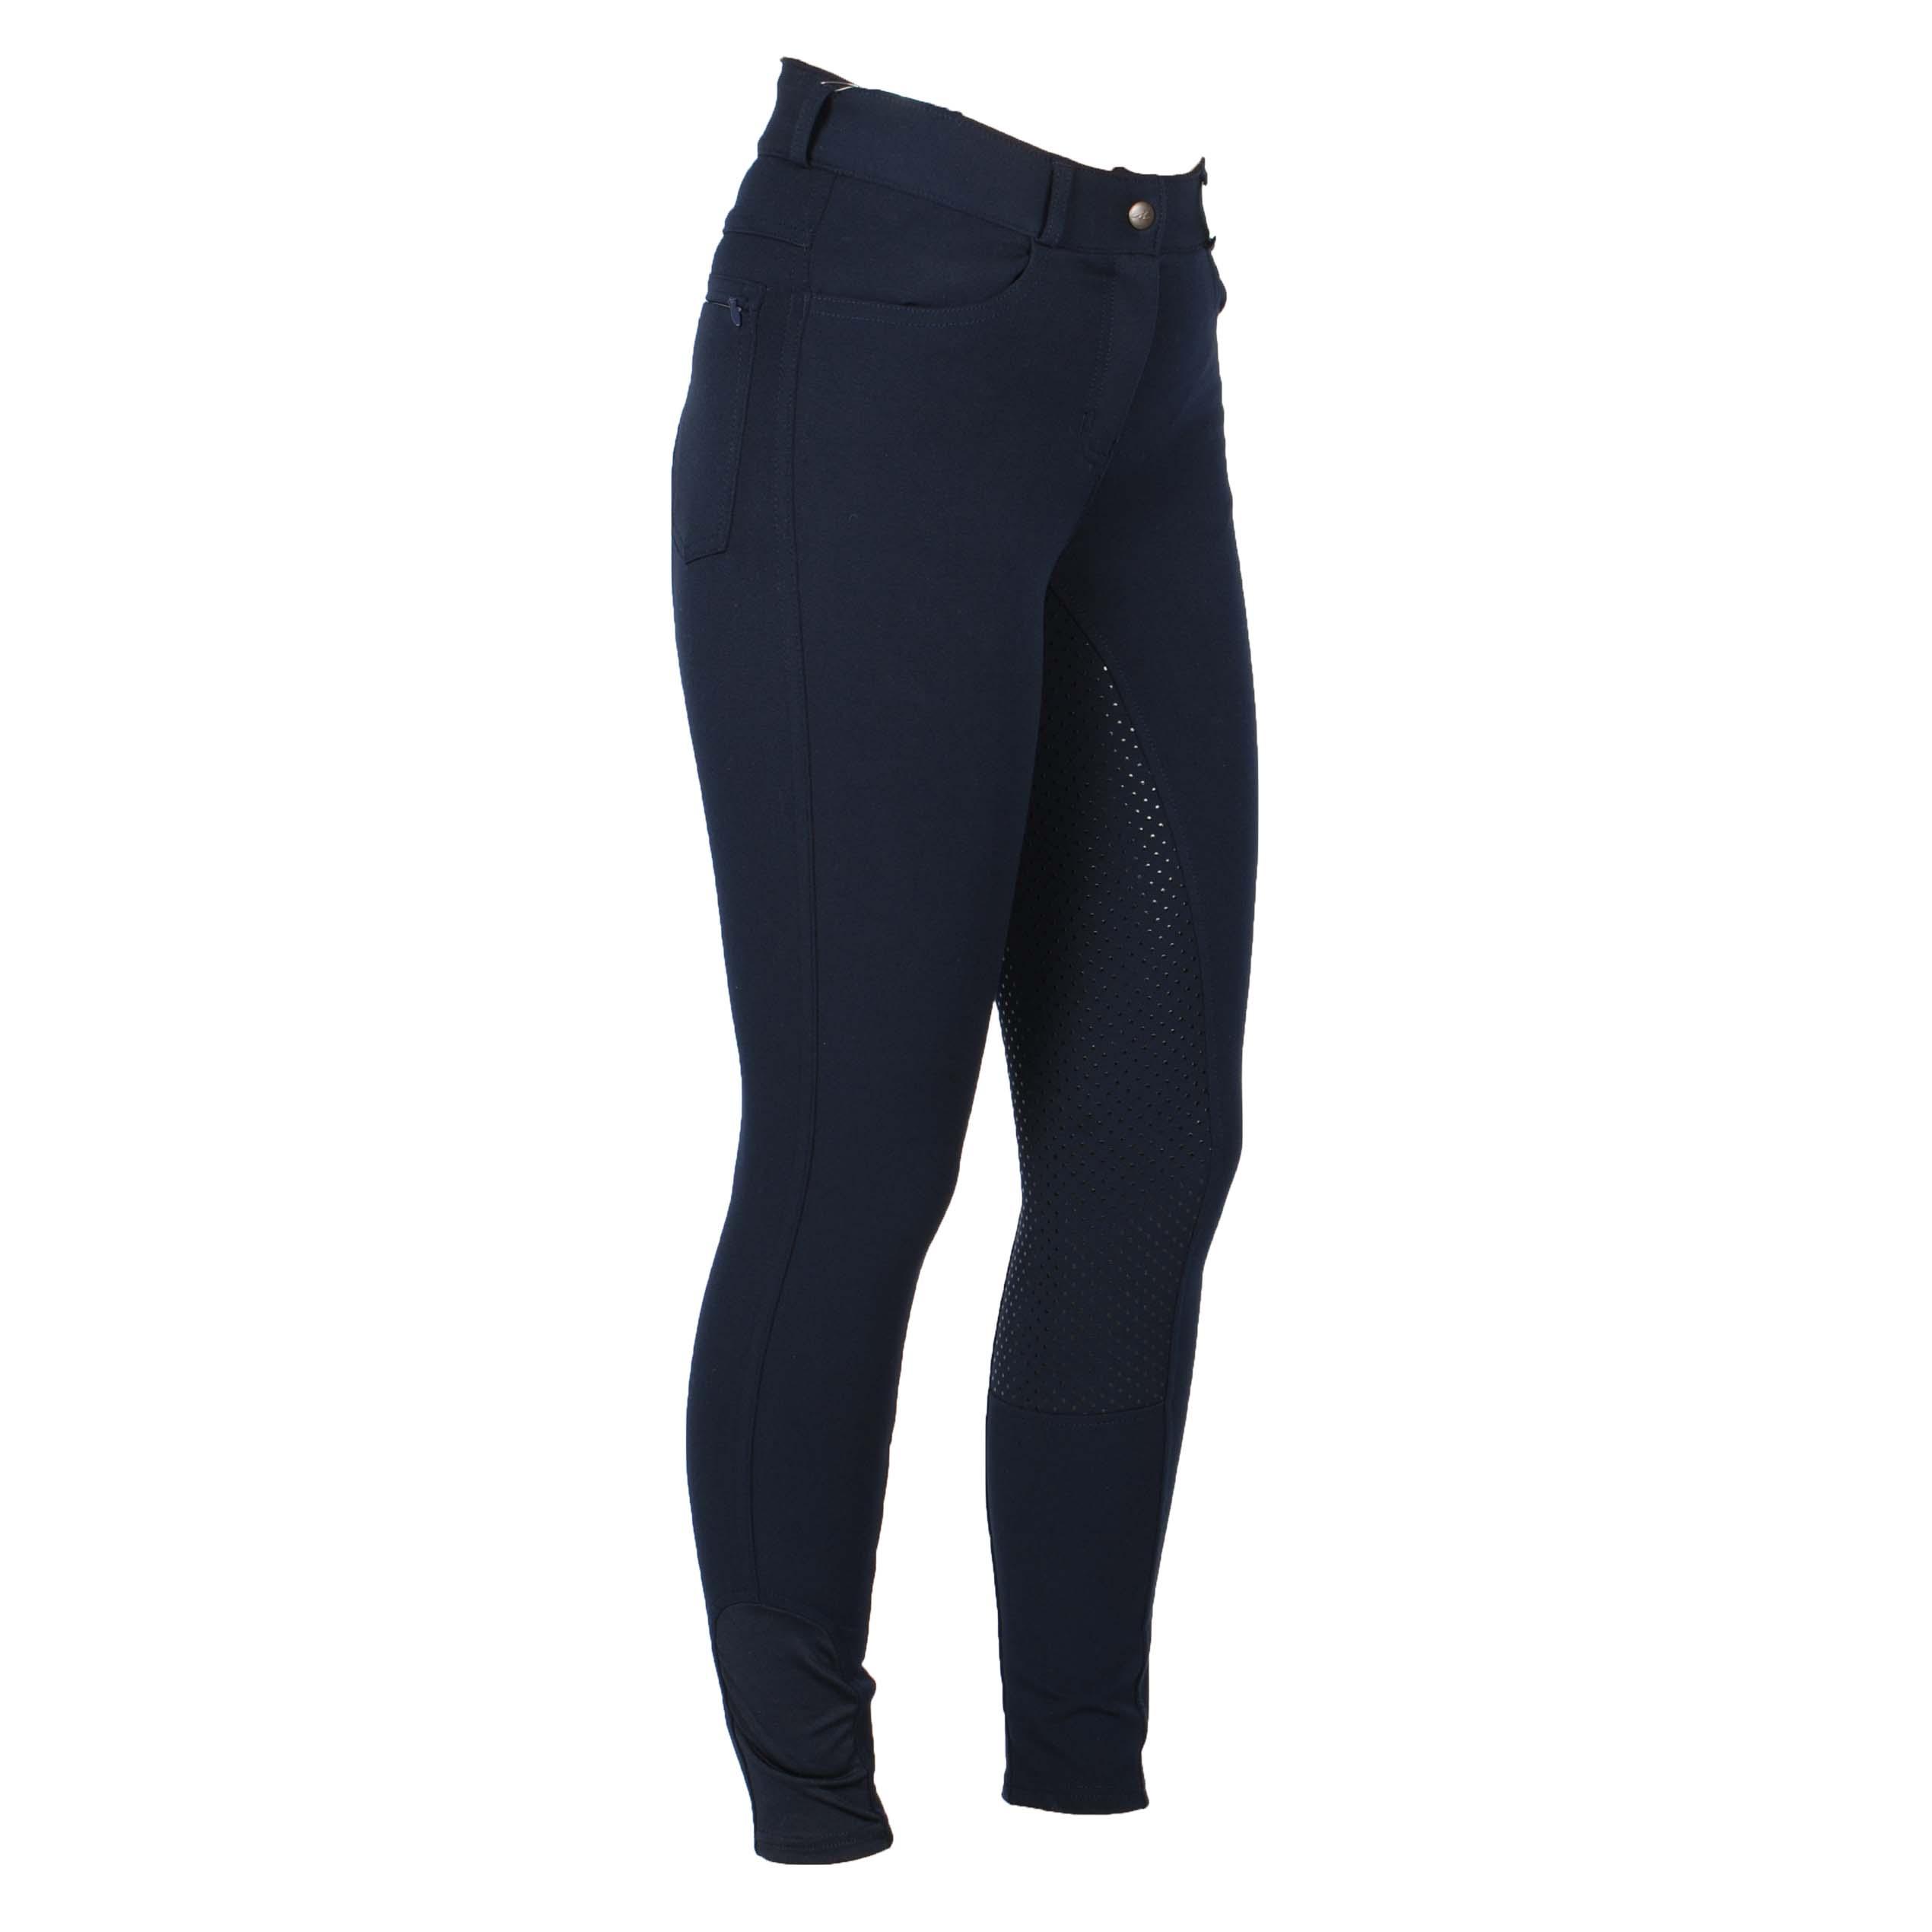 Mondoni Sada high waist full grip rijbroek donkerblauw maat:36